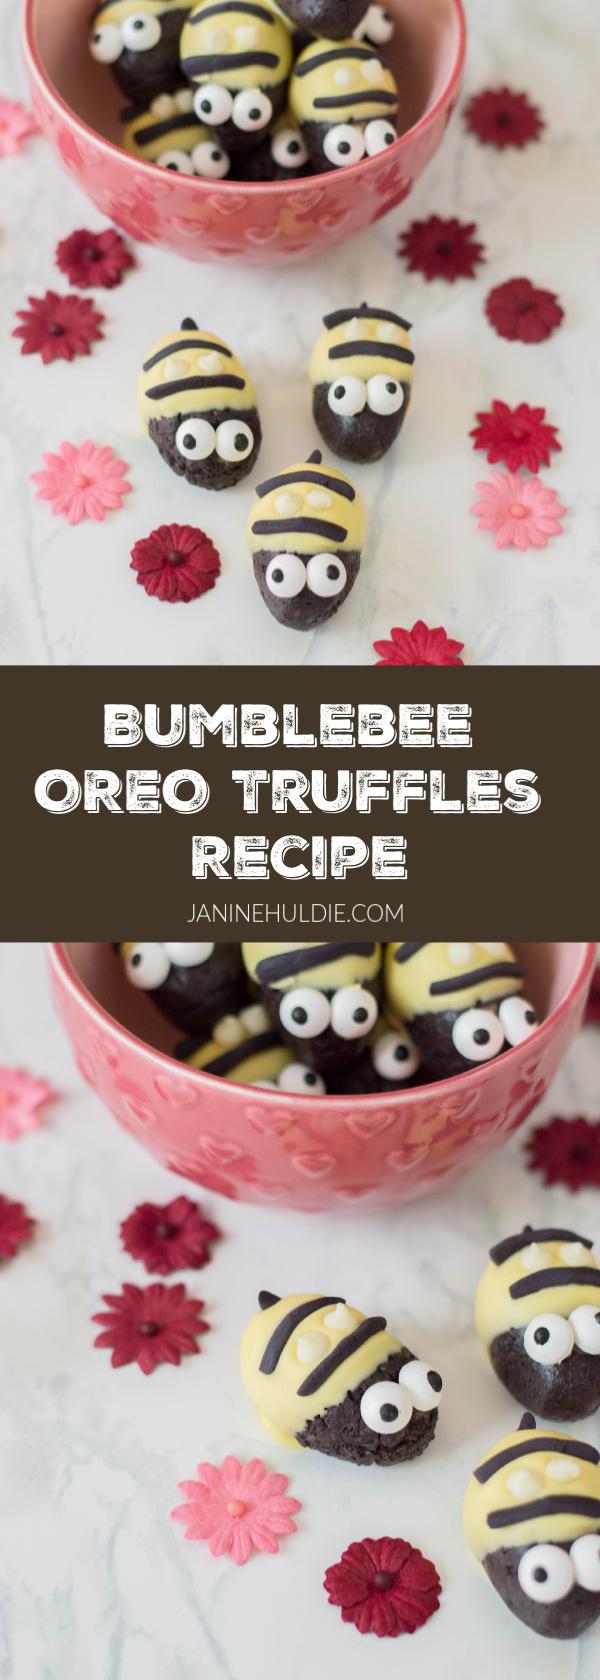 Bumble Bee Truffles Recipe